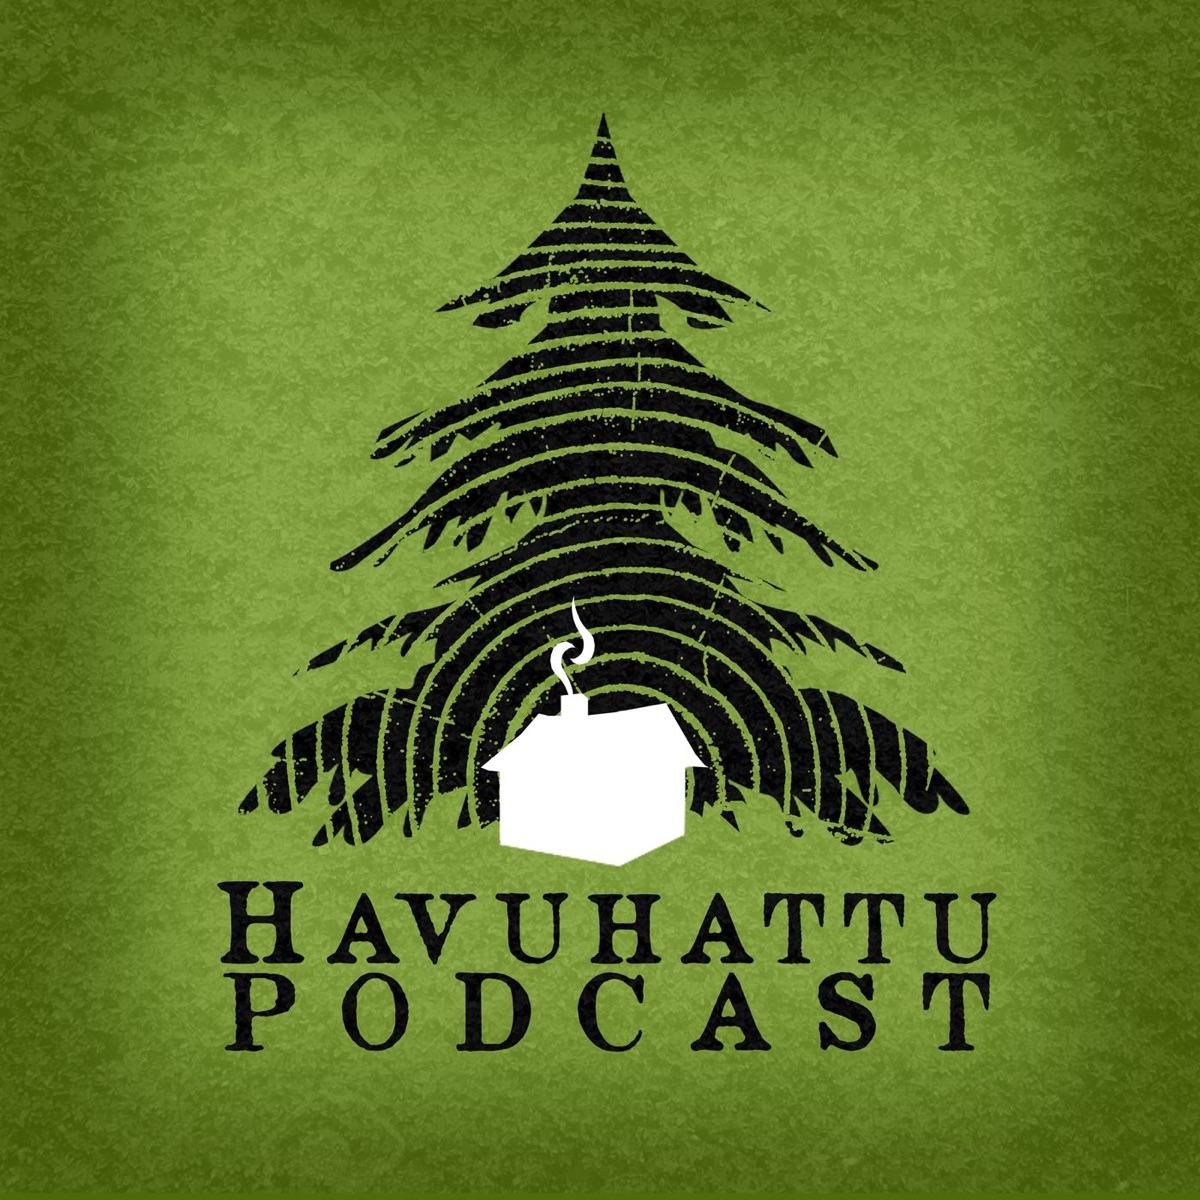 Havuhattu podcast